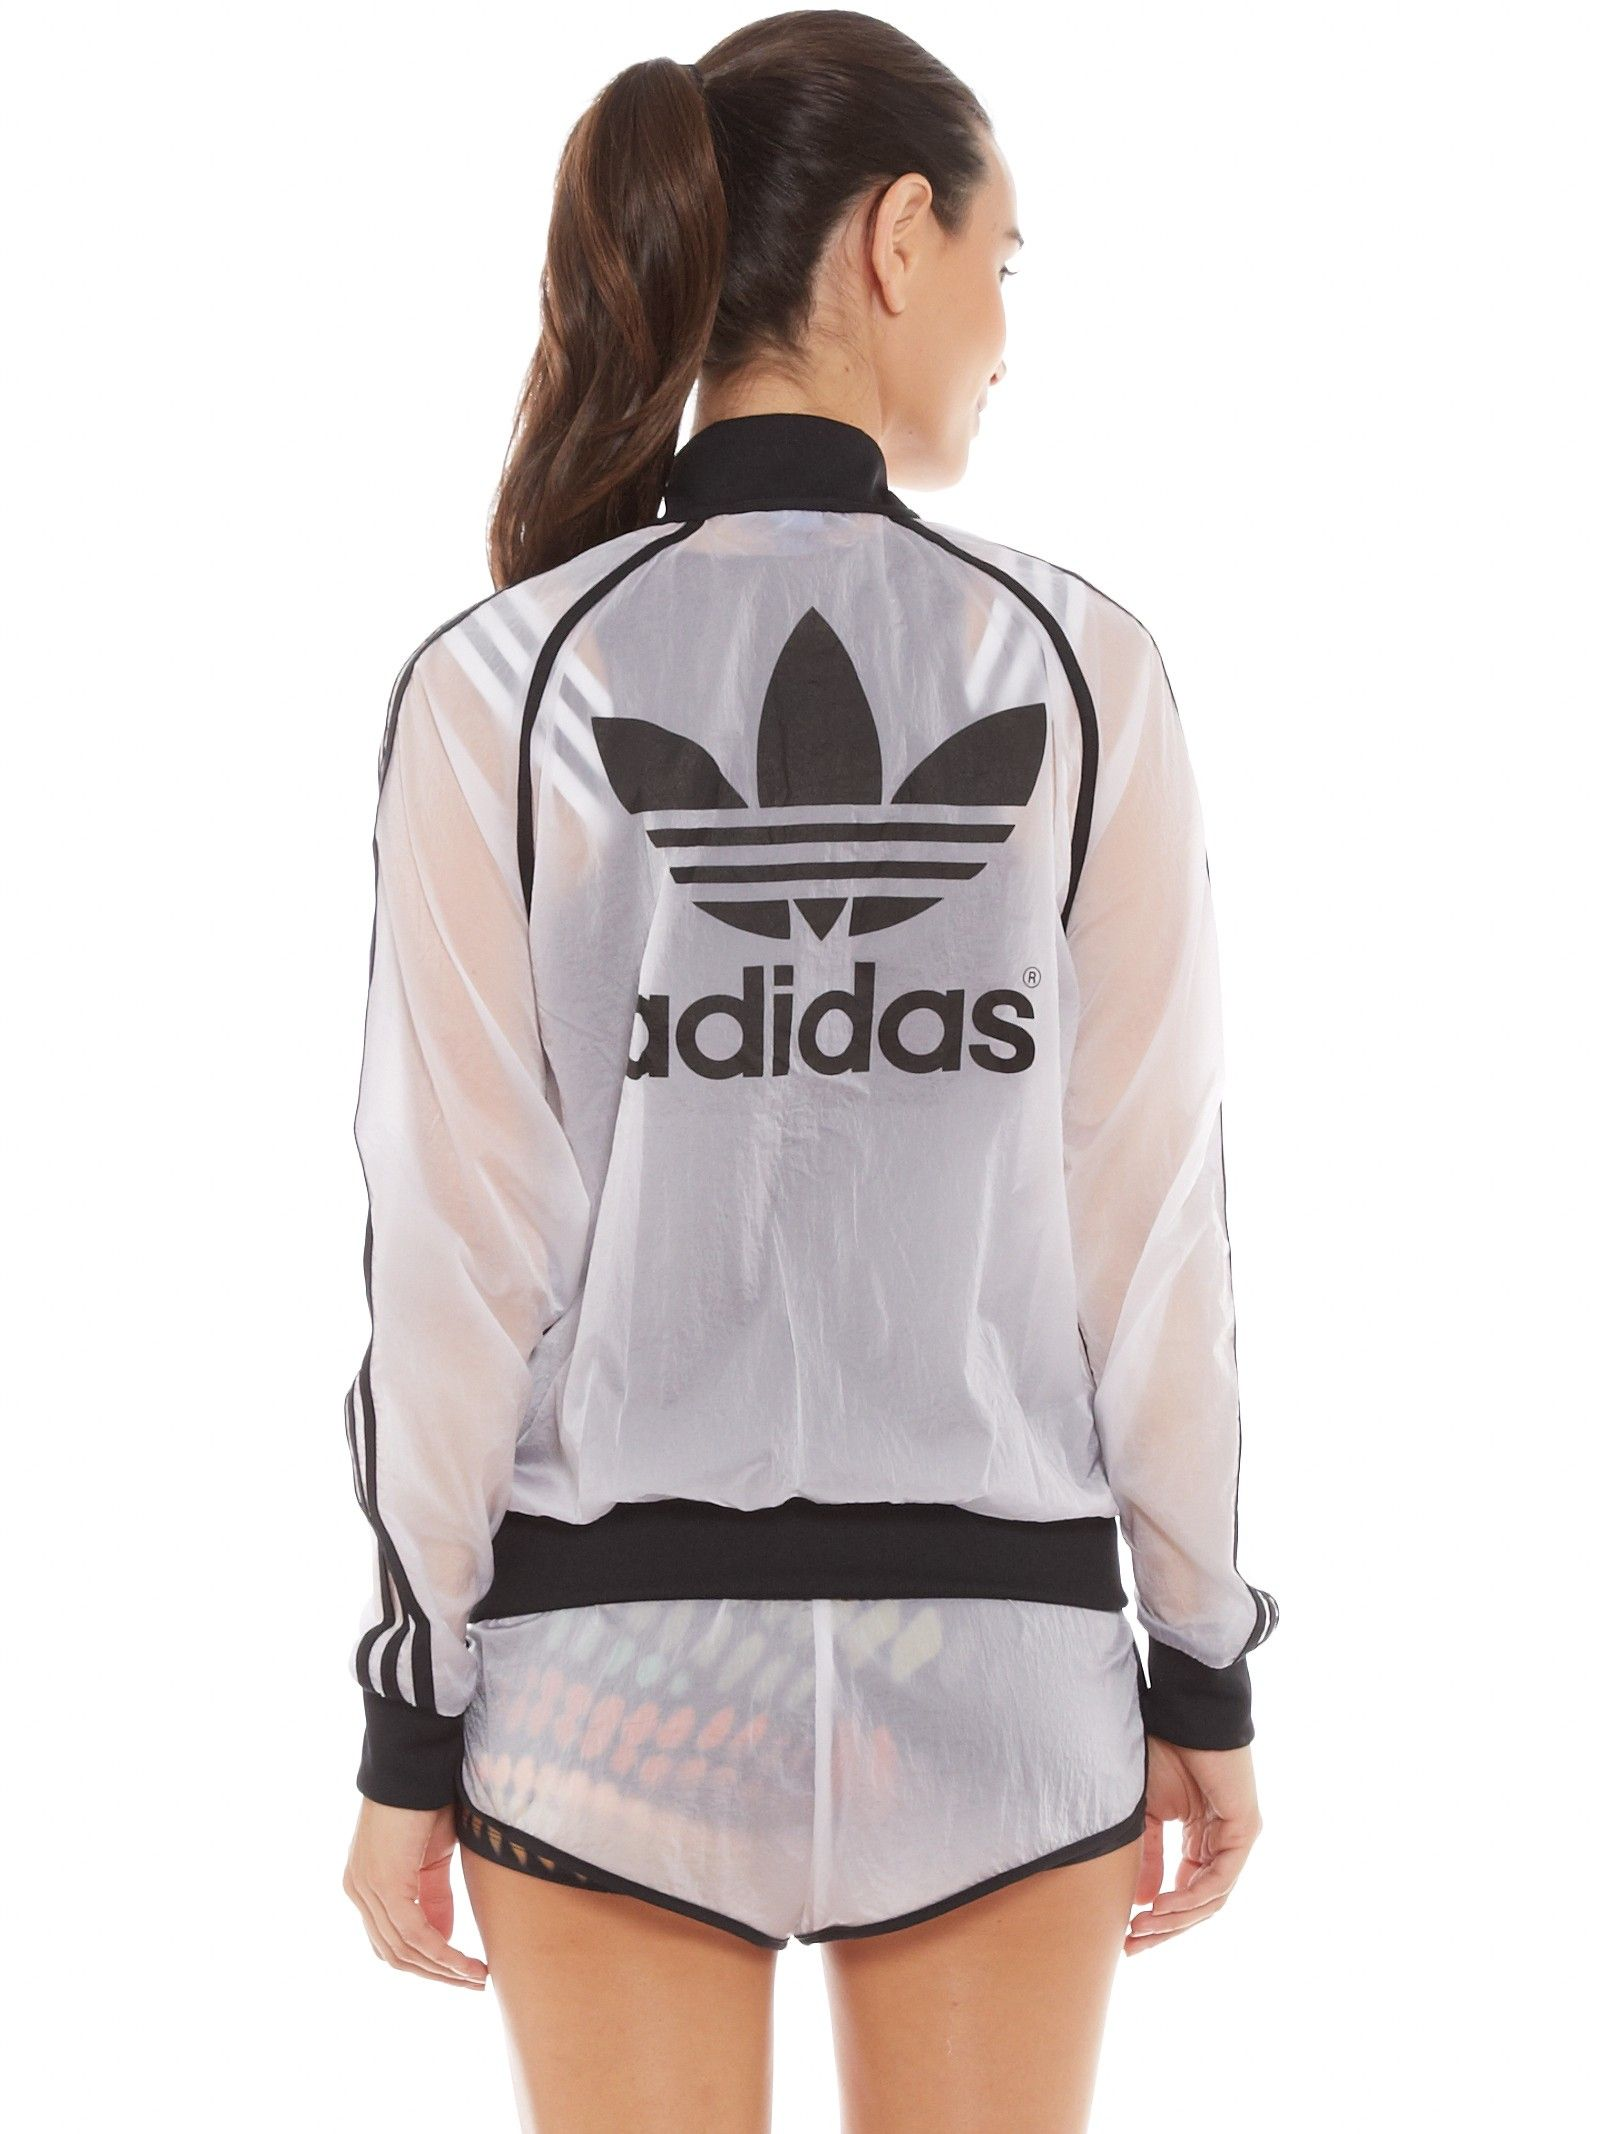 adidas r1 w, ADIDAS men Coats and Jackets Bombers Light grey